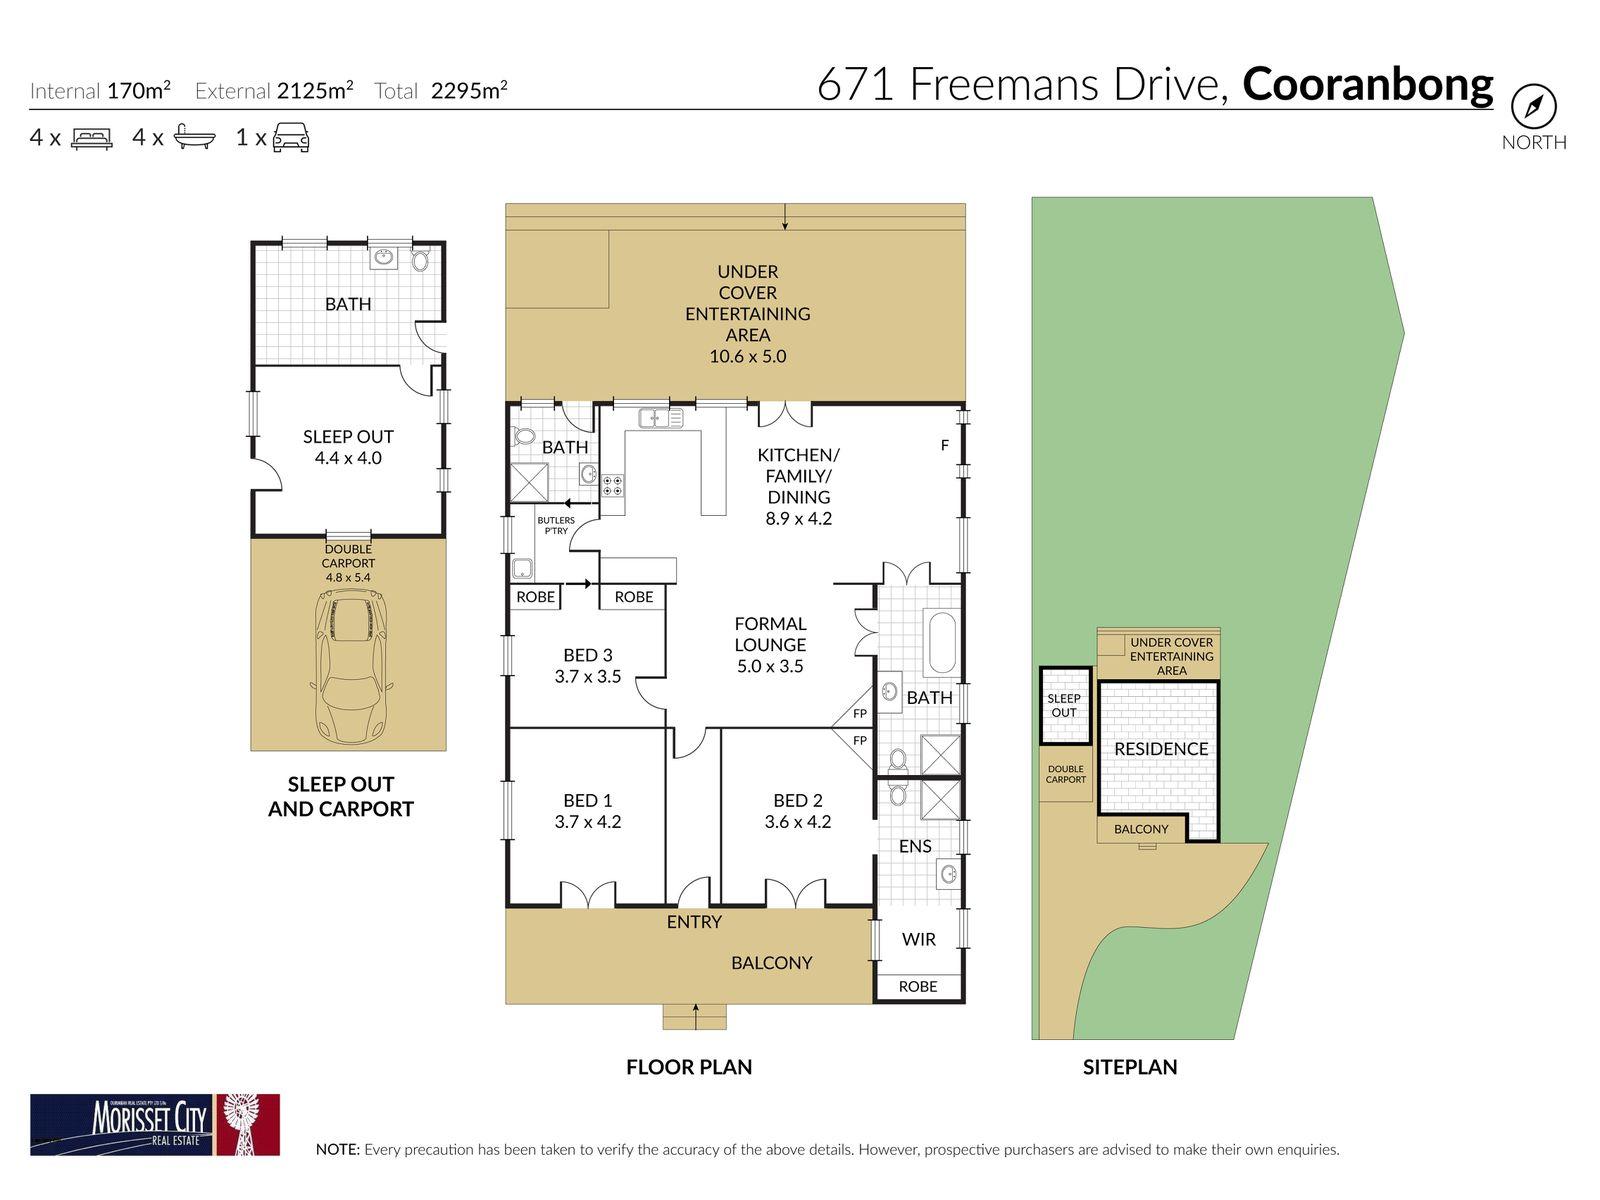 671 Freemans Drive, Cooranbong